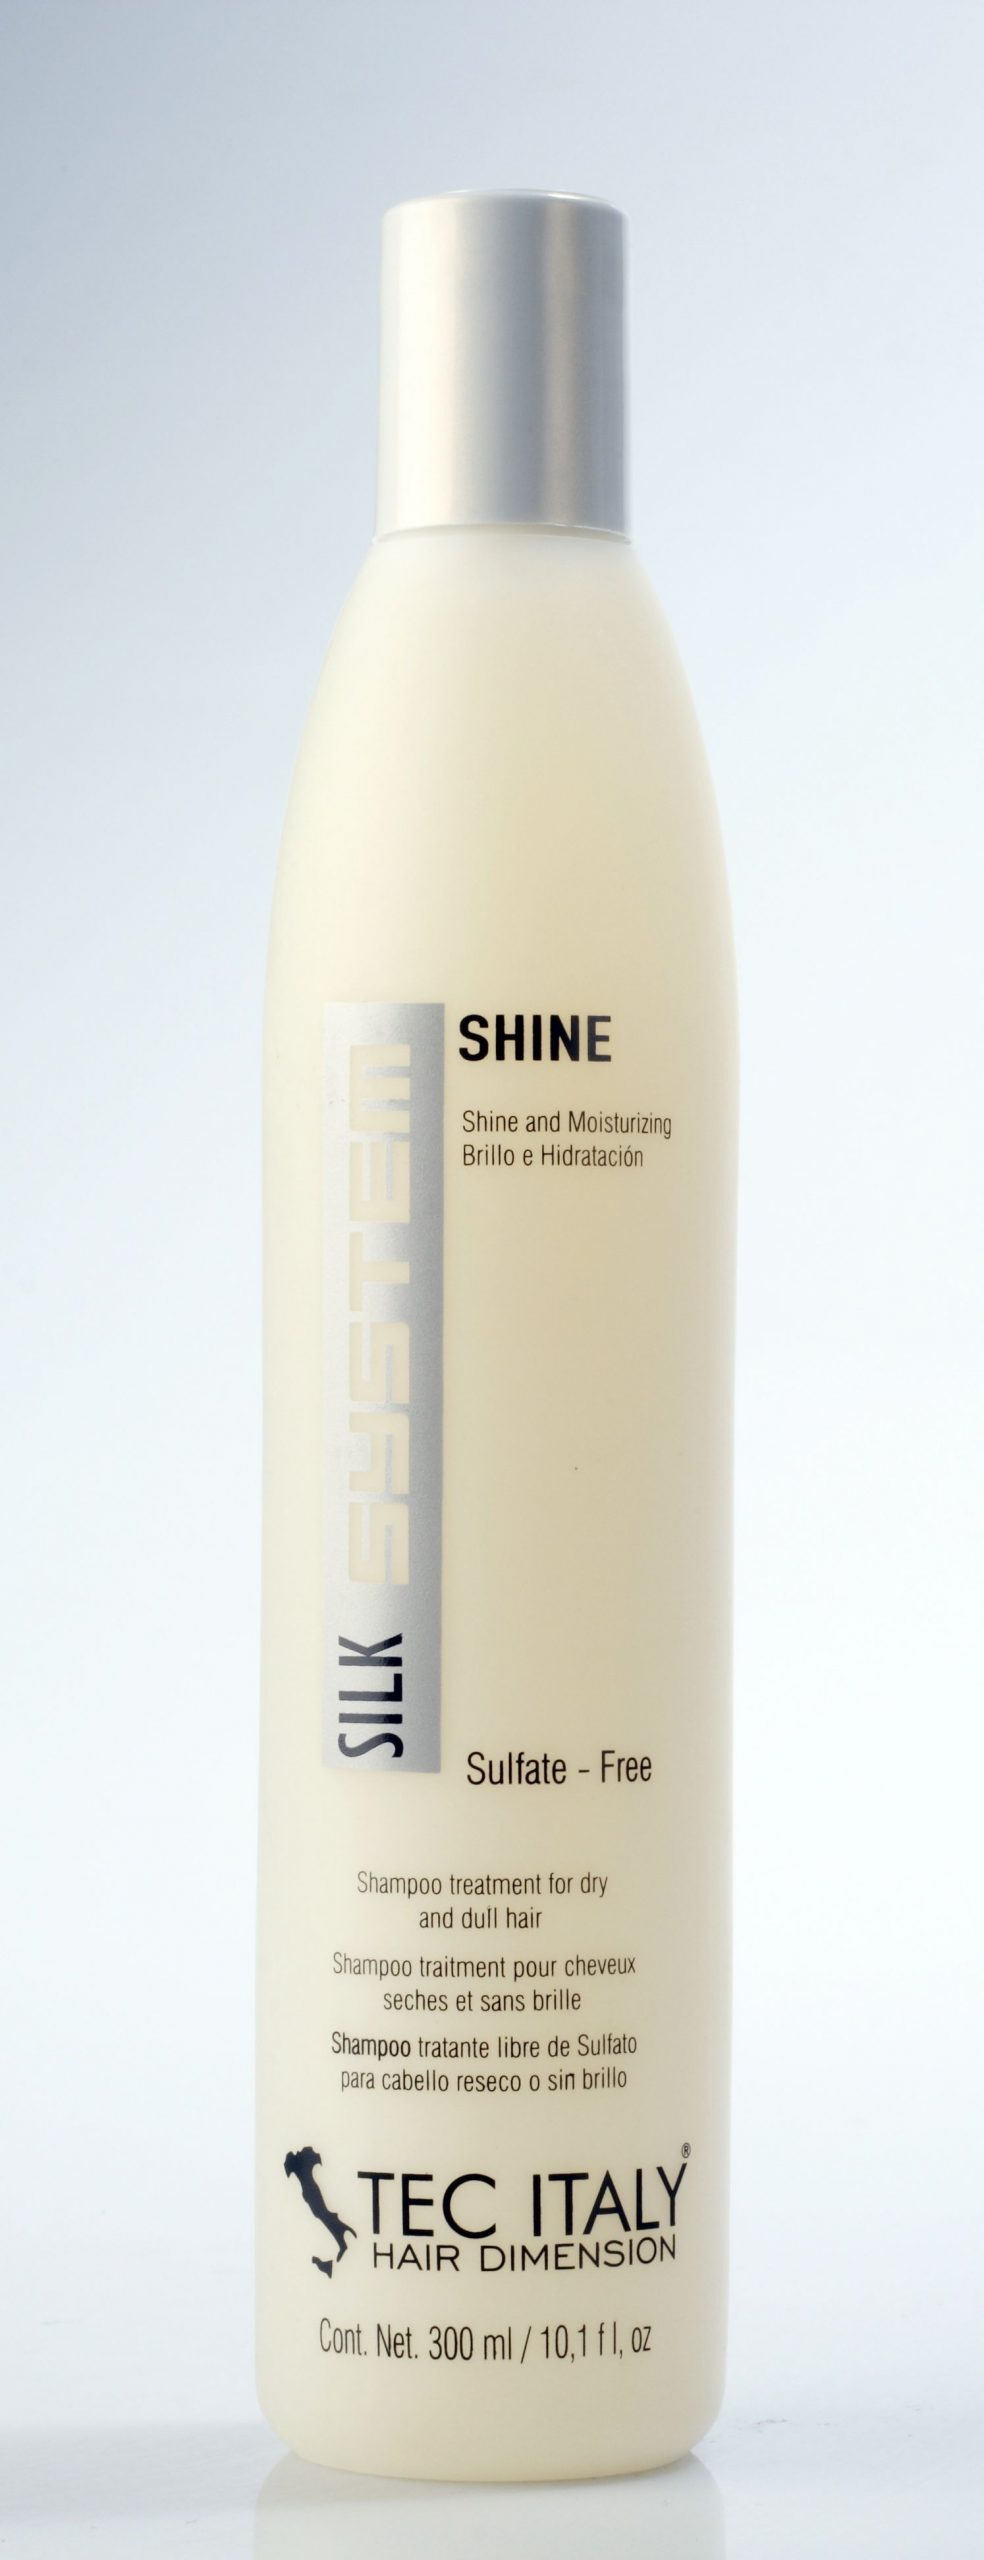 Park Art|My WordPress Blog_Tec Italy Hair Dimension Silk System Shine